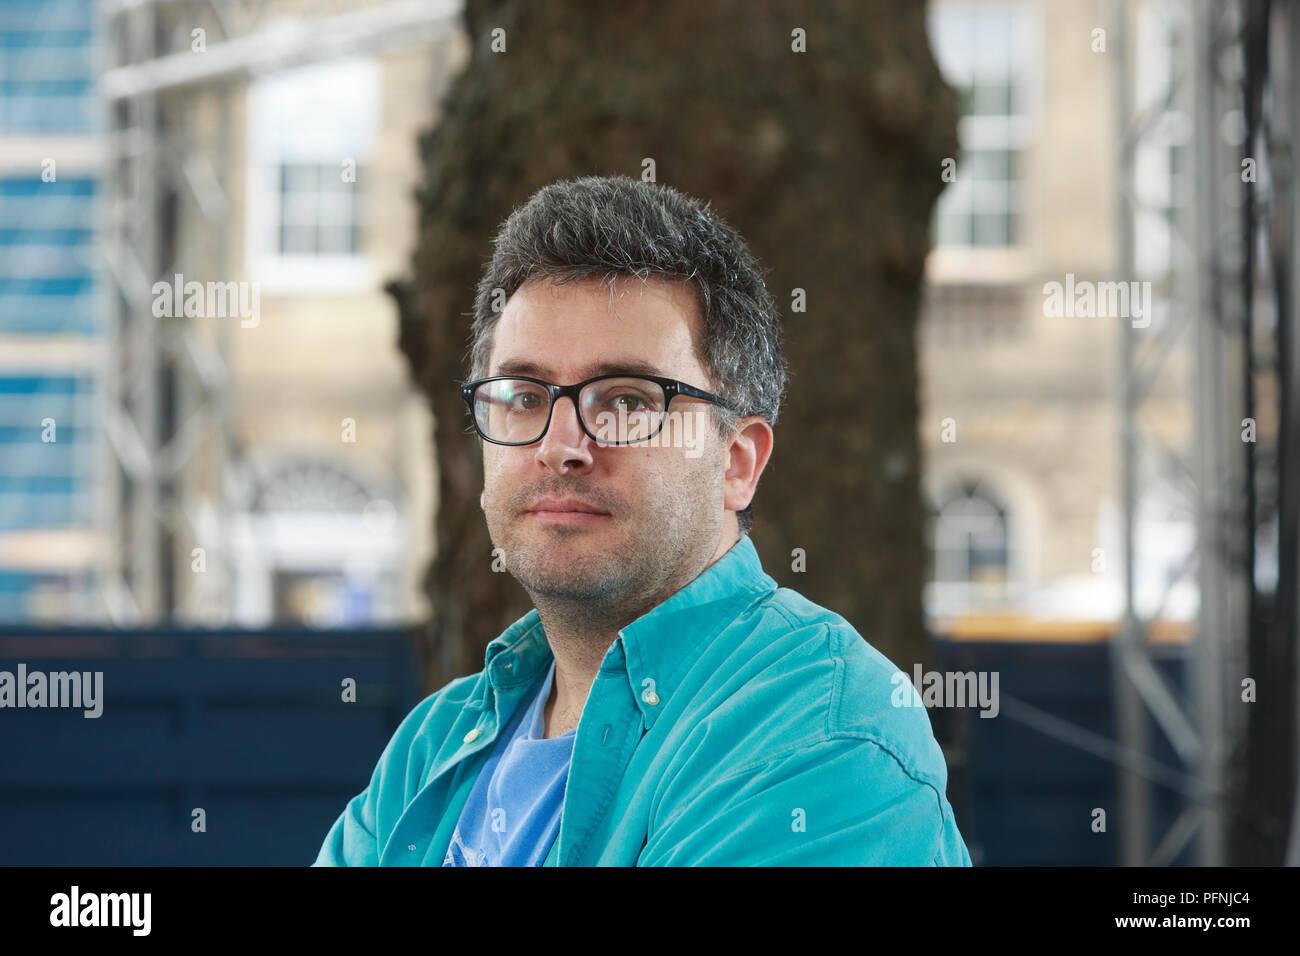 Edimbourg, Ecosse. UK. 21 août 2018. Edinburgh International Book Festival. Photo: Daniel Hahn . Édimbourg. Pako Mera/Alamy Live News. Banque D'Images